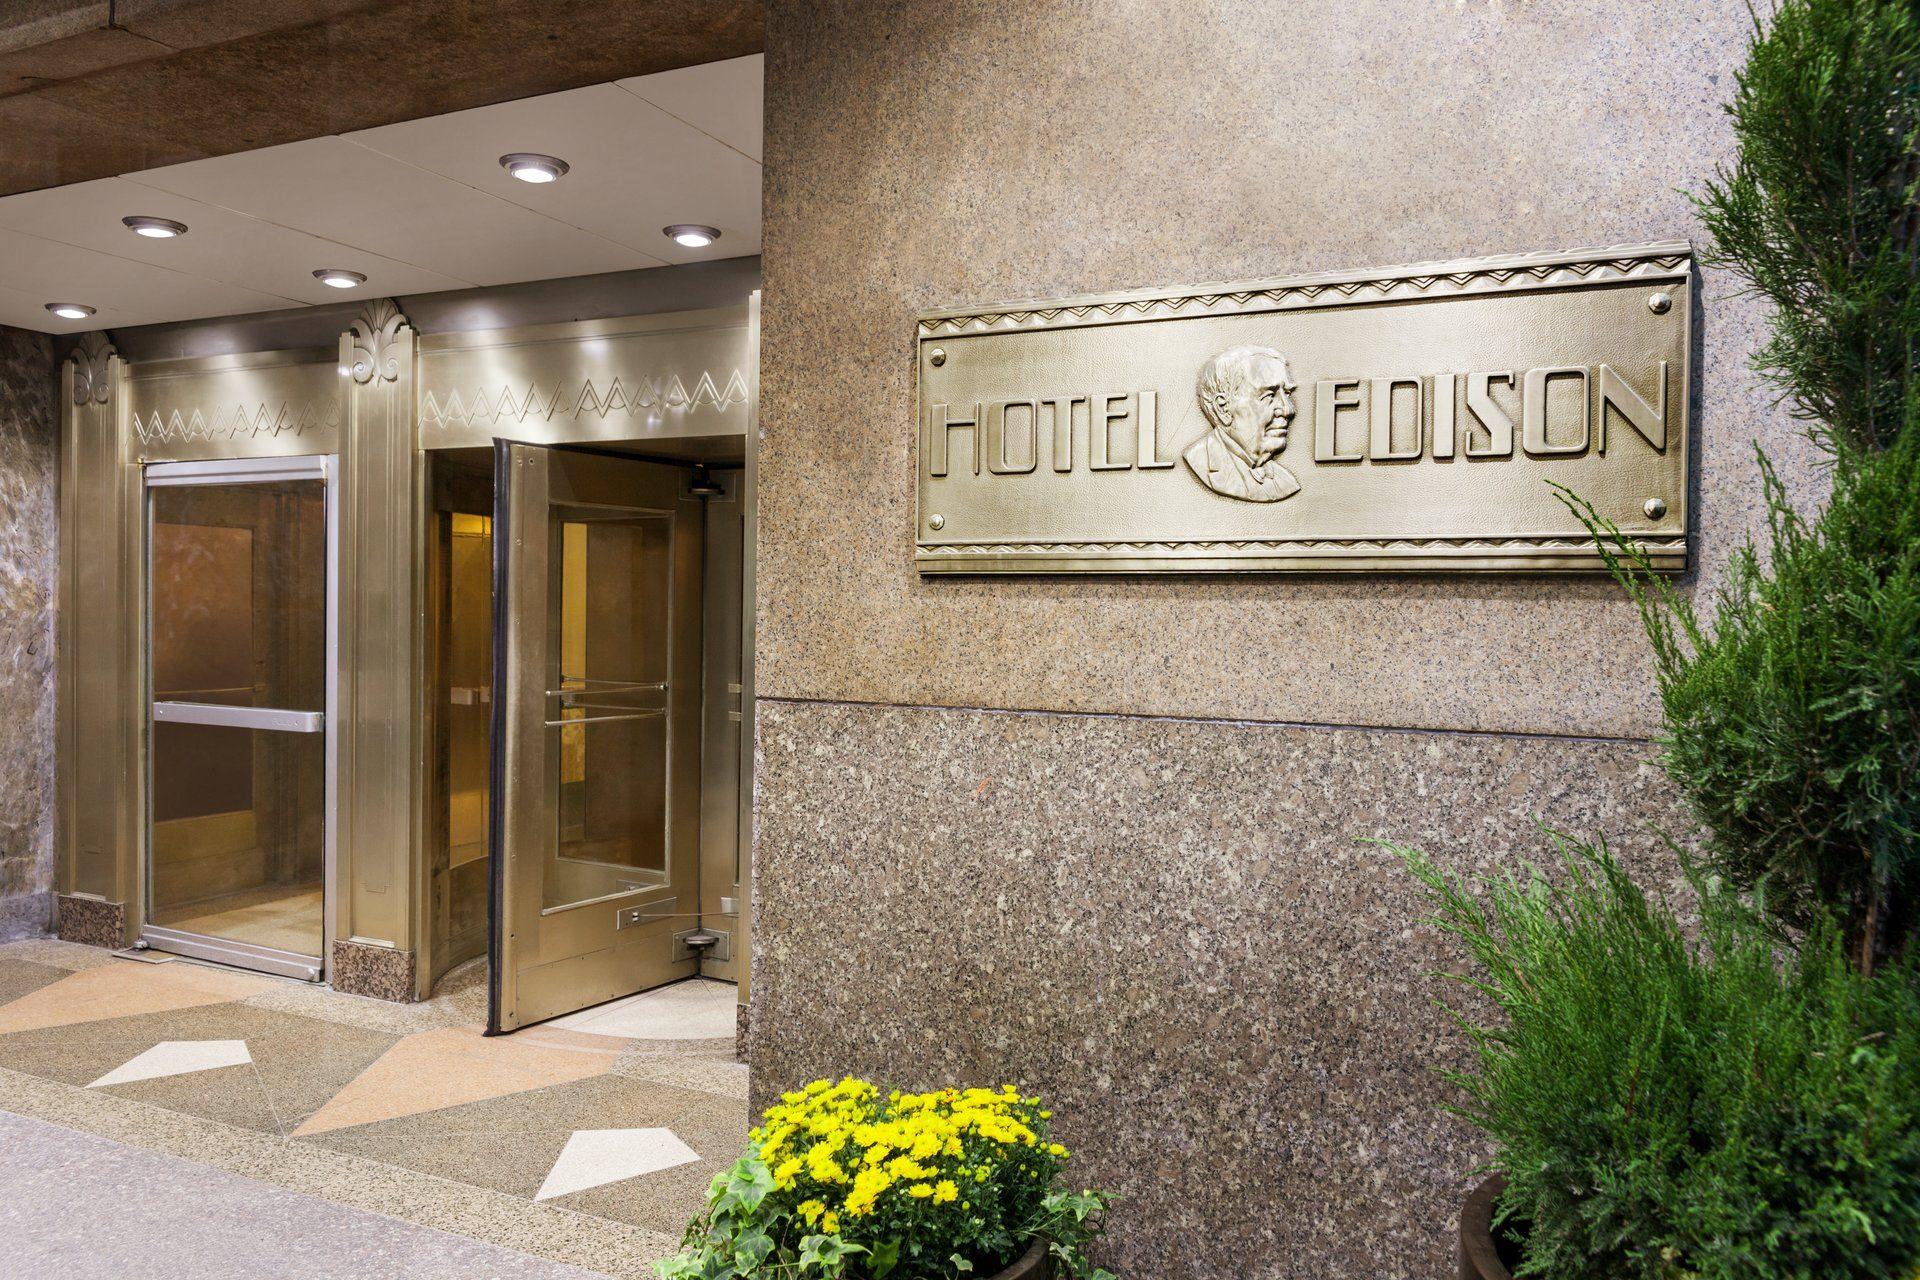 Hotel Edison - New York City